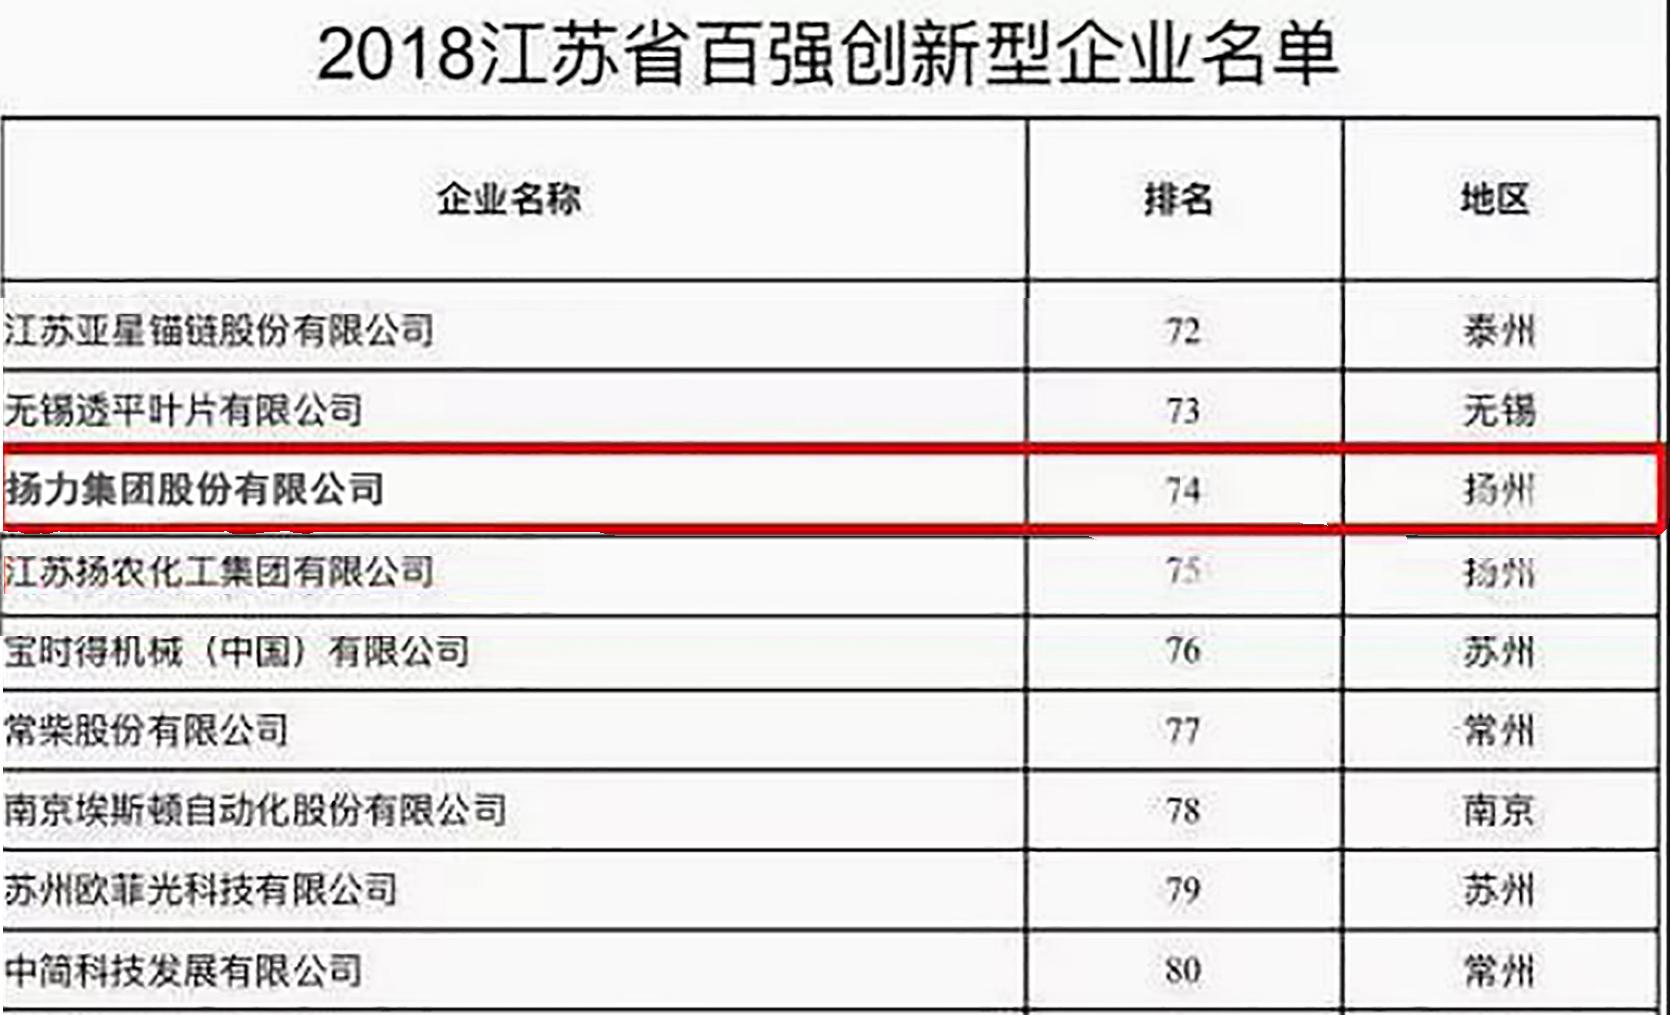 <strong>扬力集团入选2018江苏省百强创新型企业!</strong>